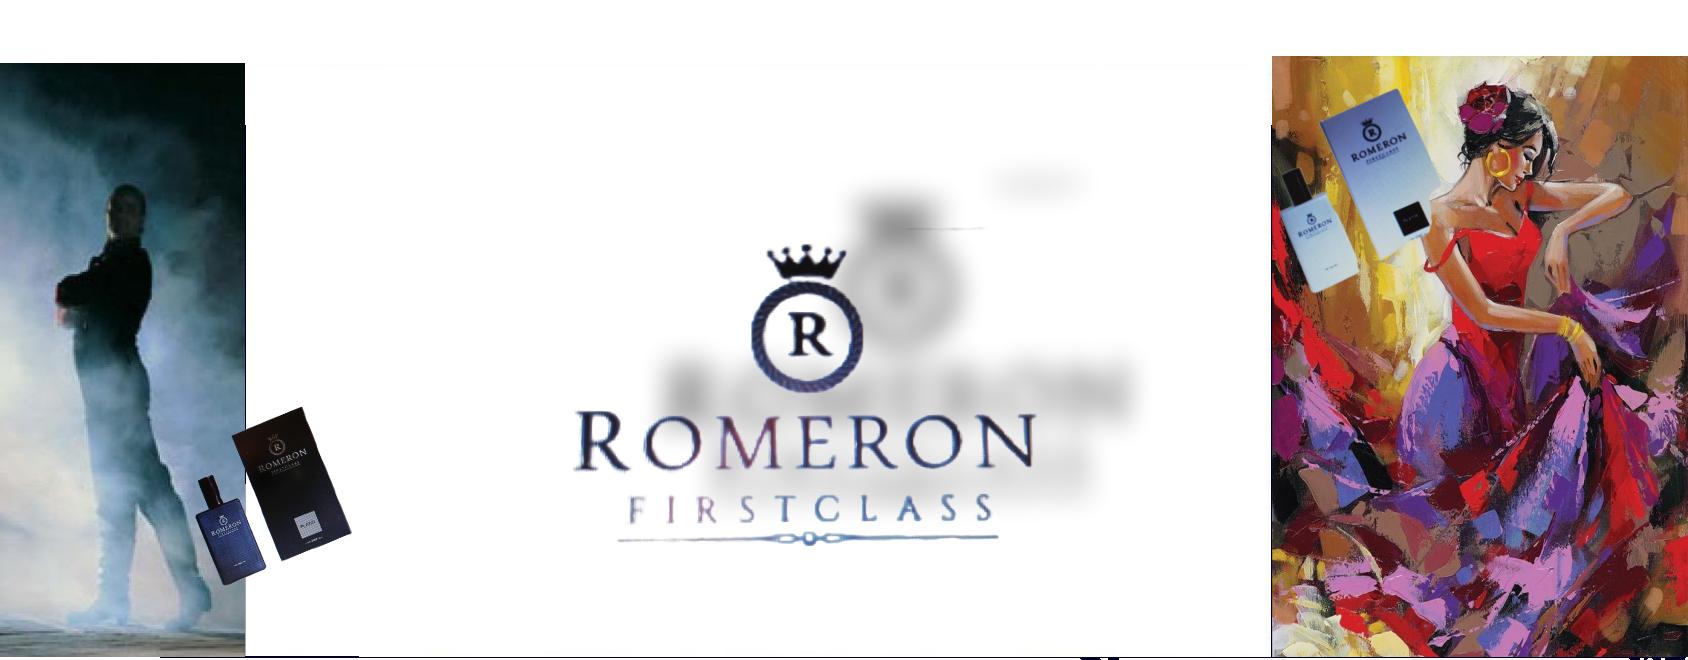 Romeron Parfüm banner